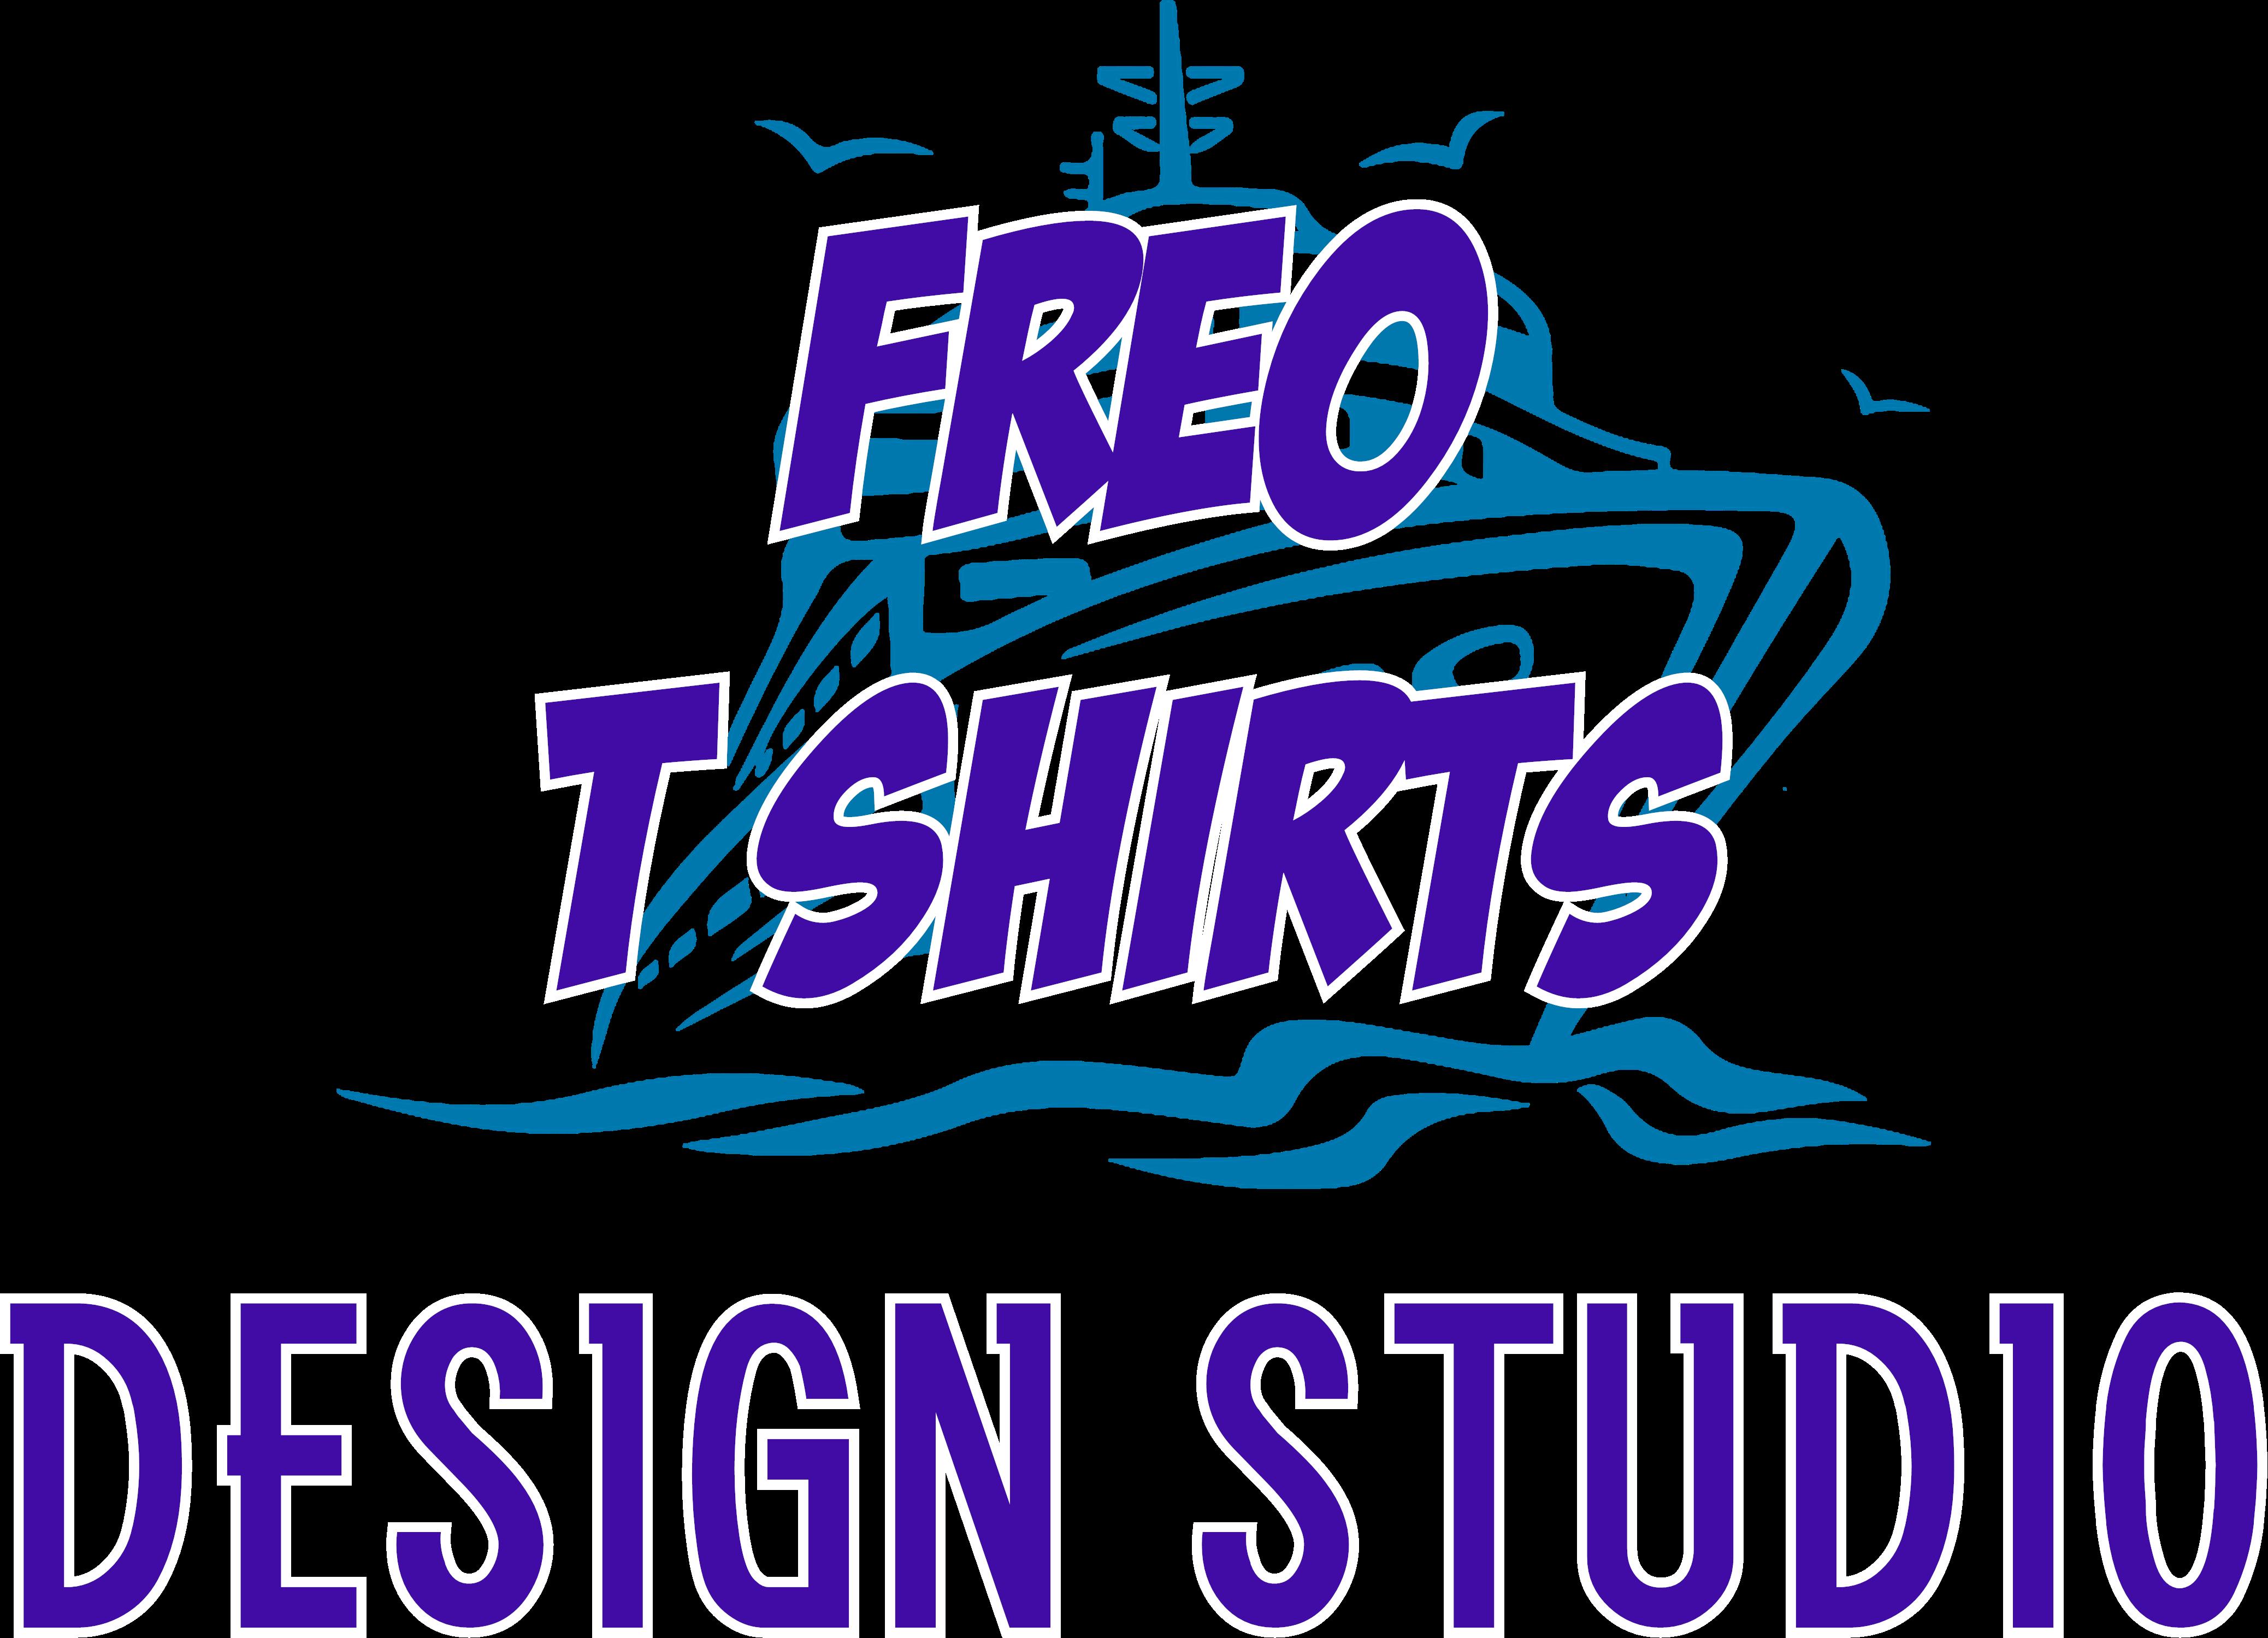 FREO T SHIRTS – Custom T Shirt Printing